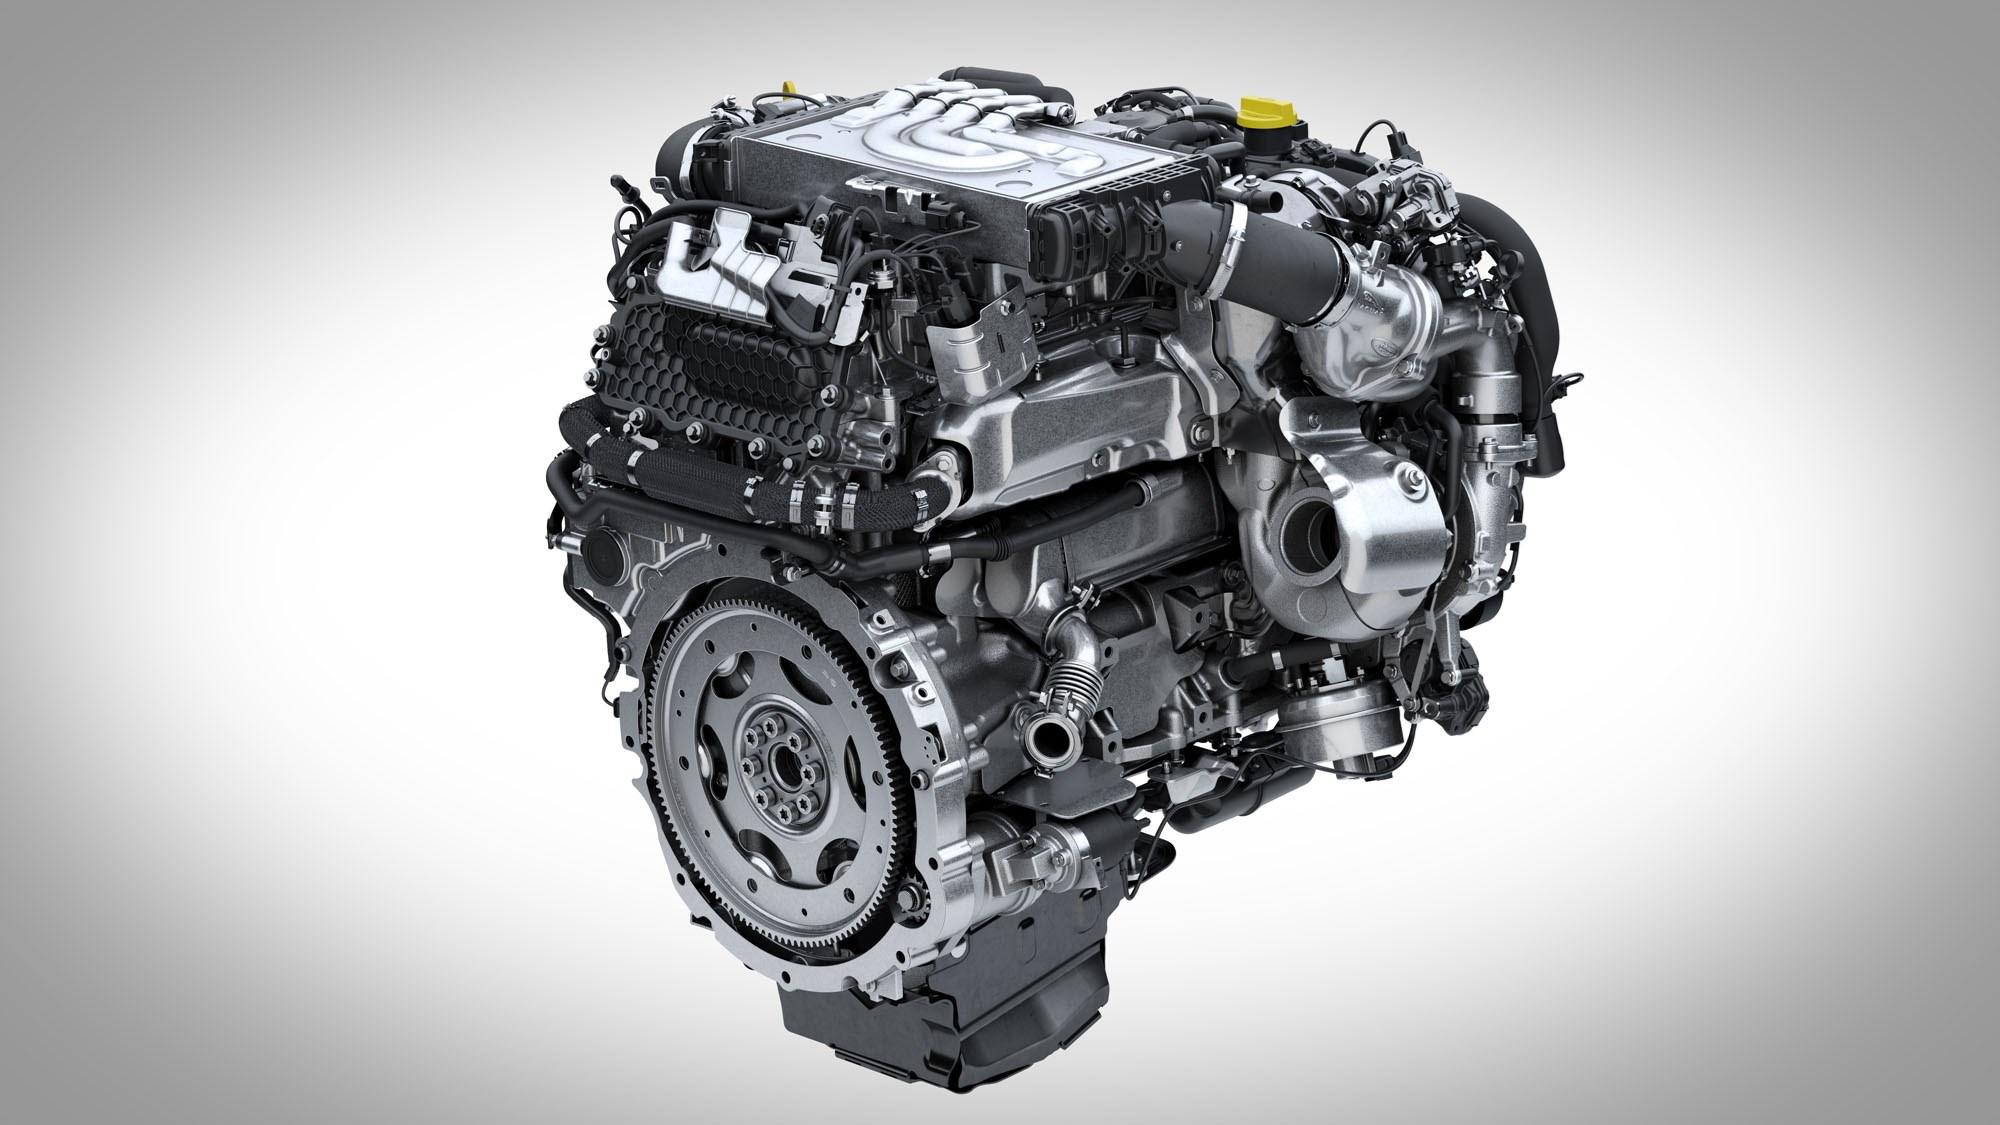 Land Rover Range Rover Sport D350 engine